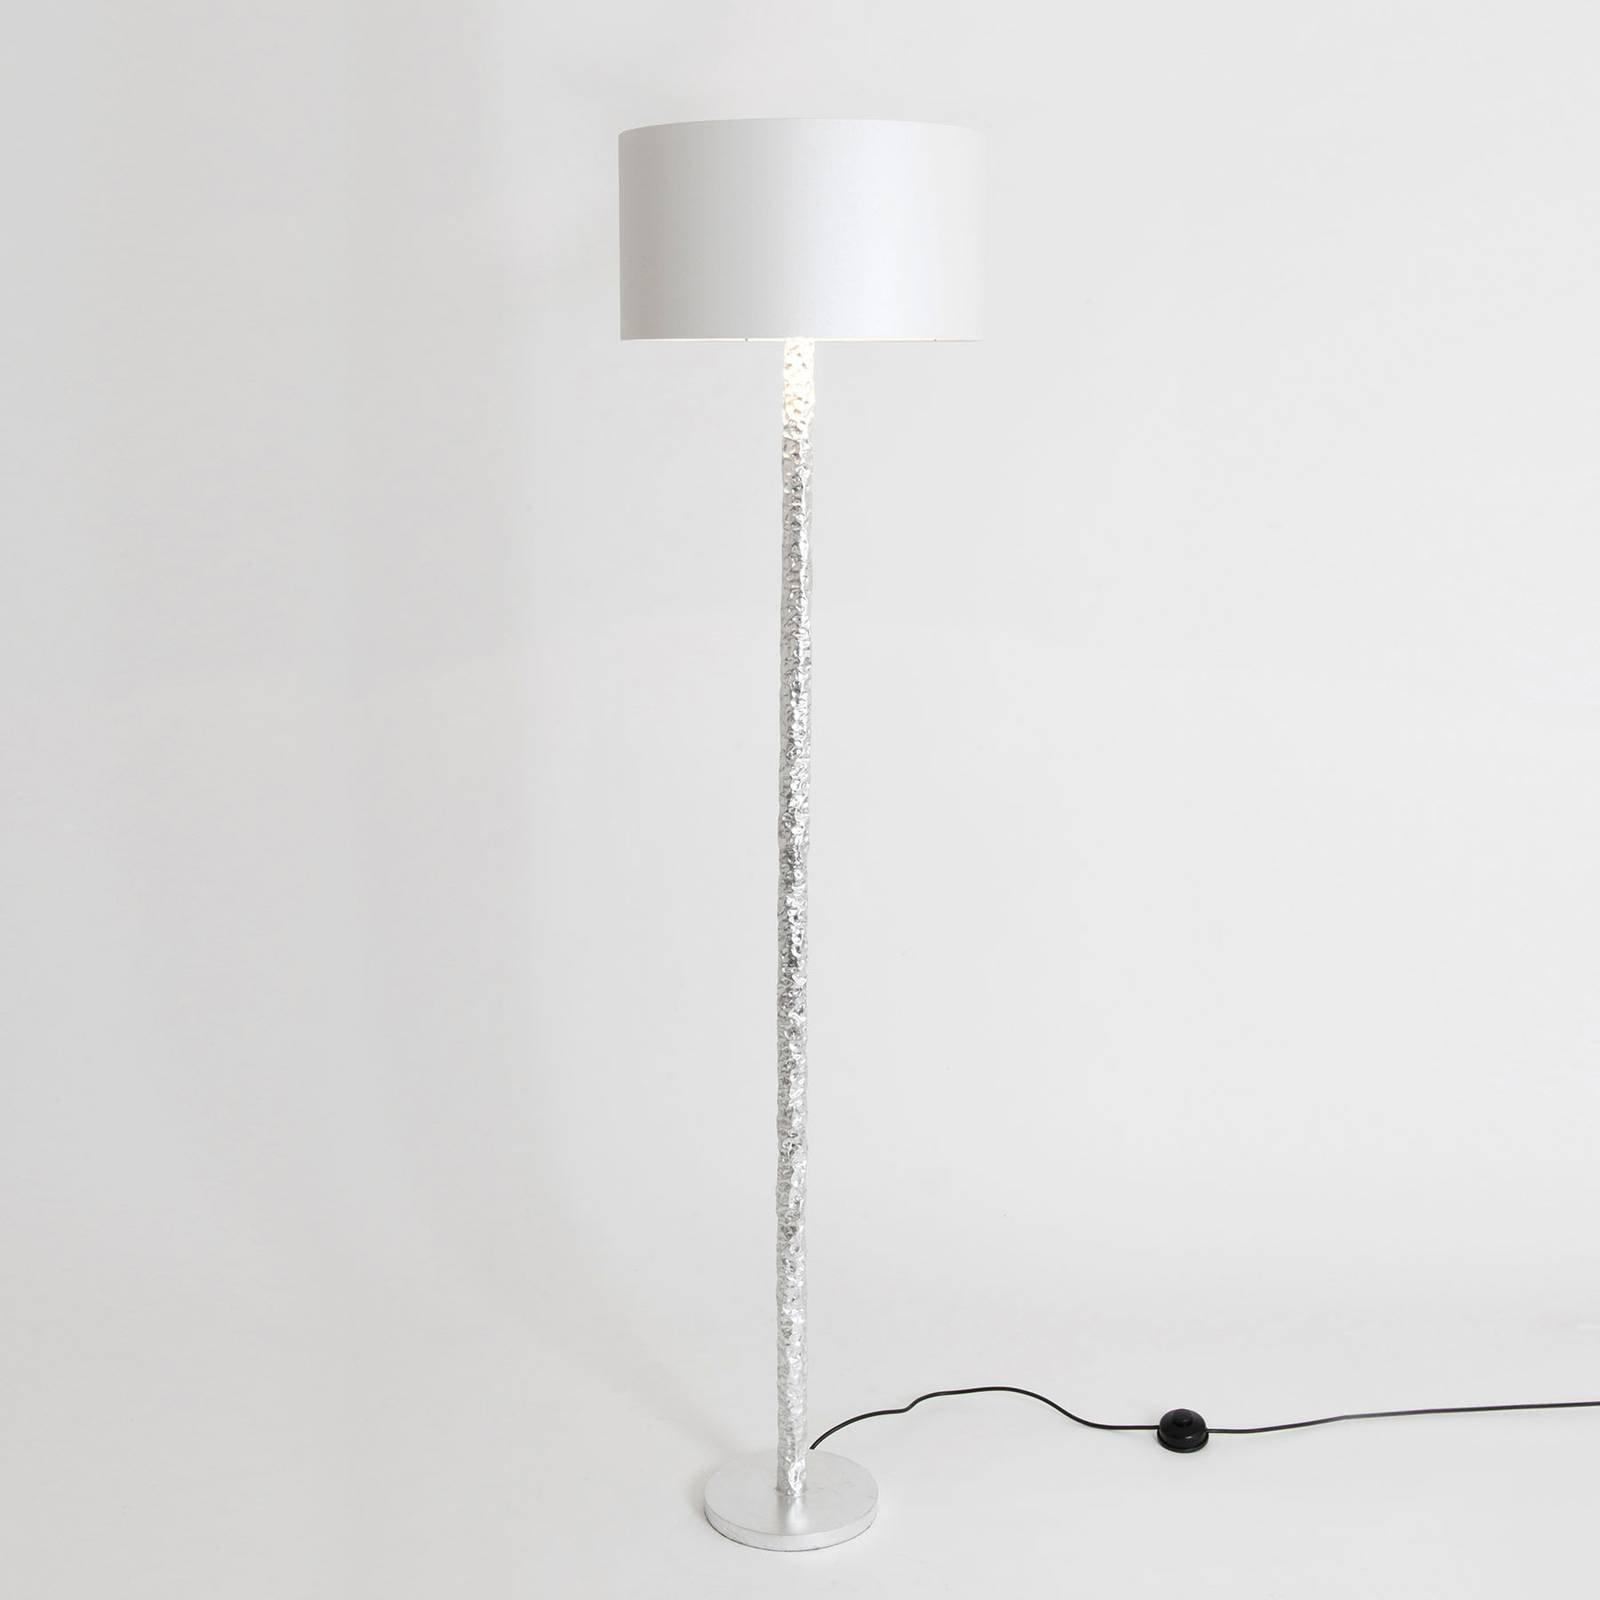 Gulvlampe Cancelliere Rotonda, silke, hvit/sølv